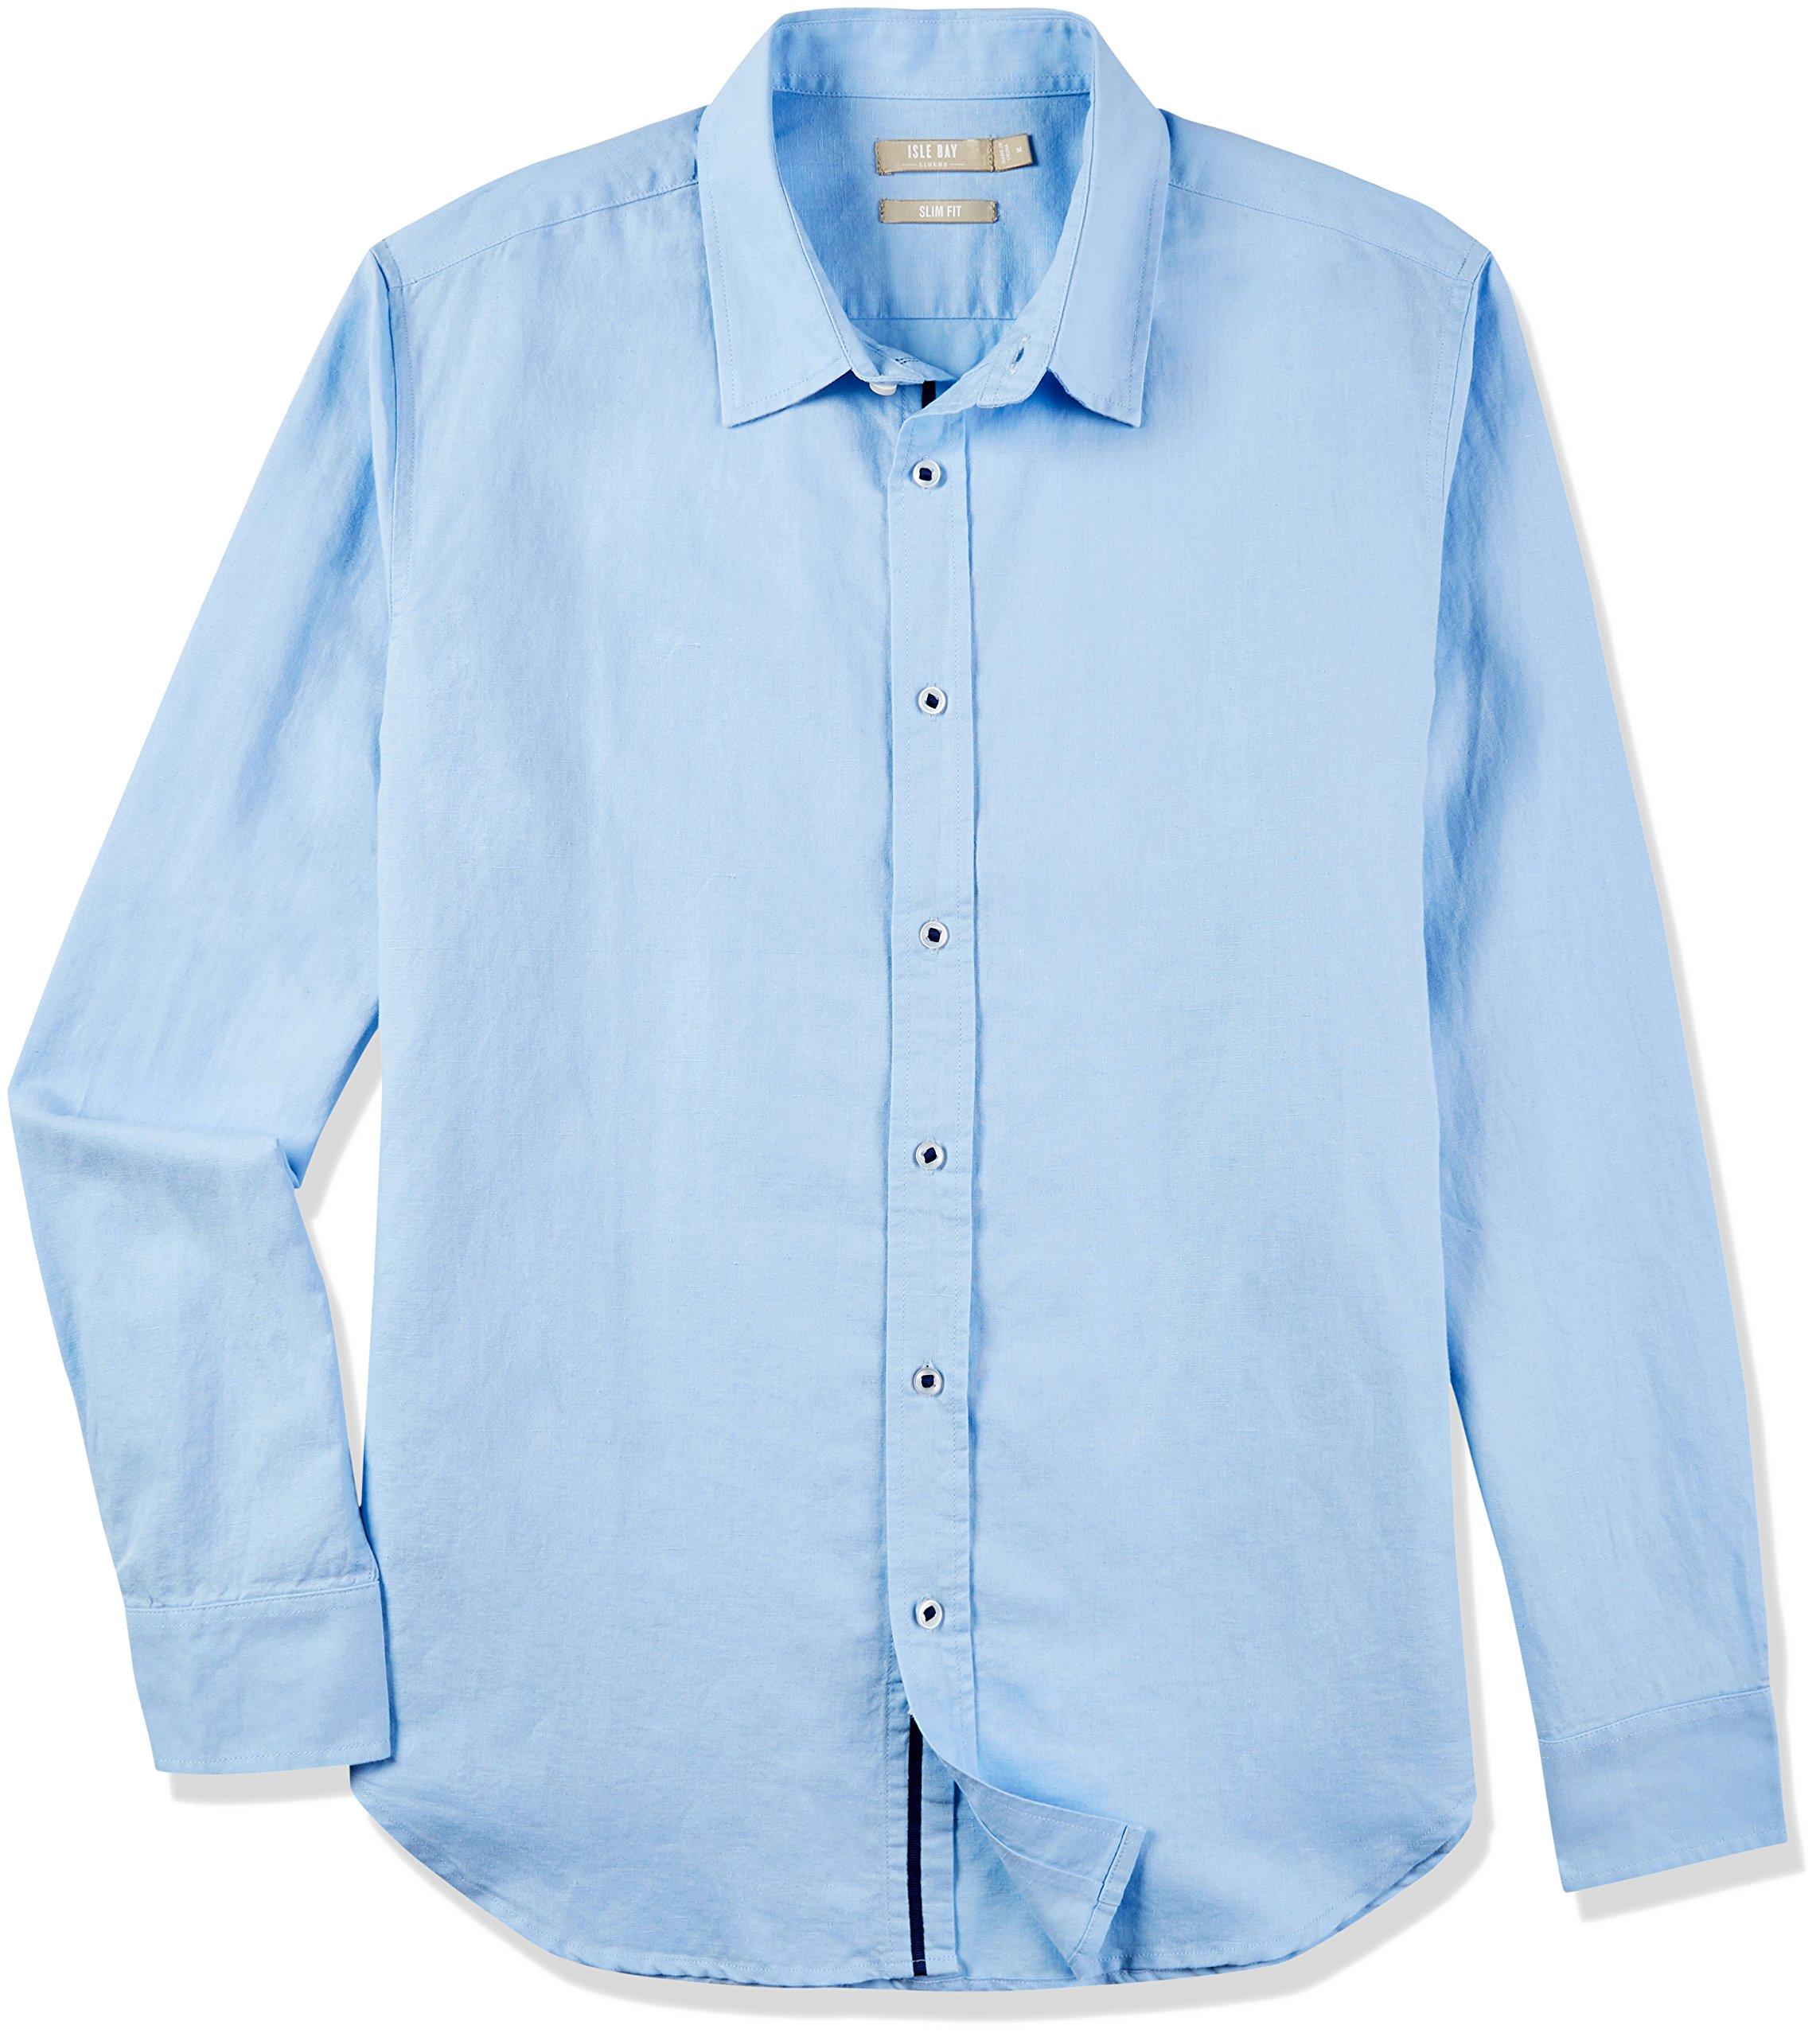 Isle Bay Linens Men's Slim-Fit Long-Sleeve Webbed-Placket Woven Shirt Sky Blue Large